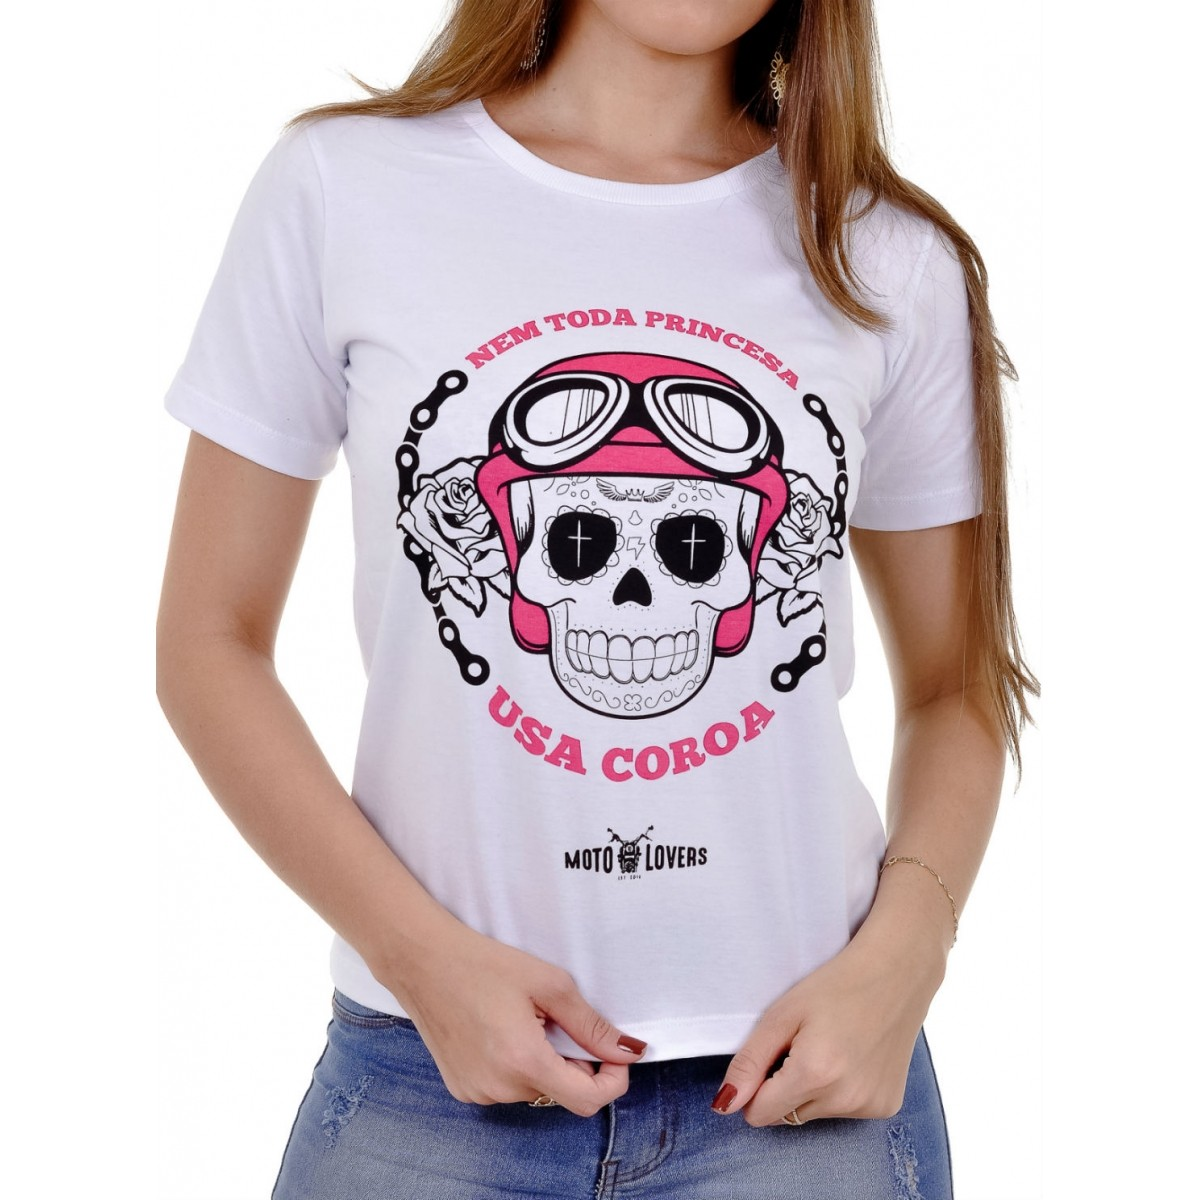 Camiseta Moto Lovers - Princesa Motociclista